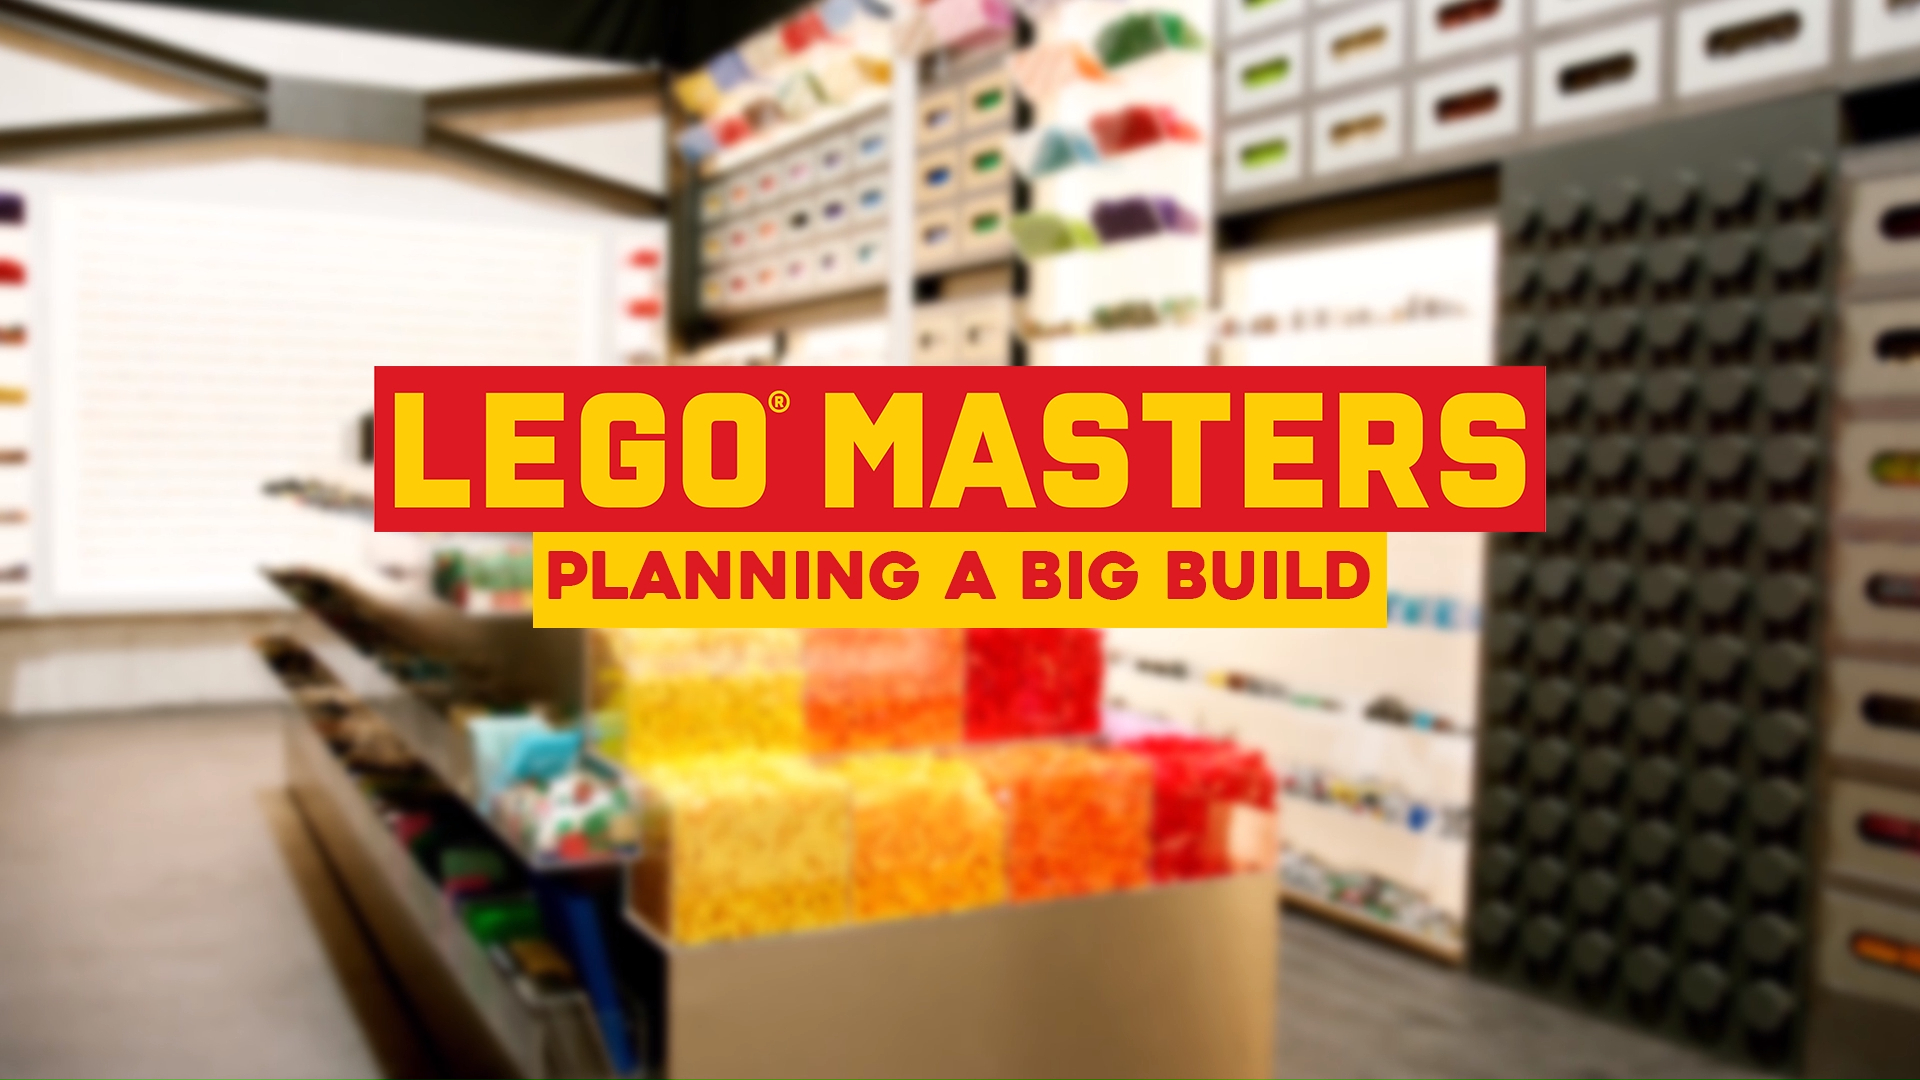 LEGO Tips Tricks and Hacks: Planning a Big Build